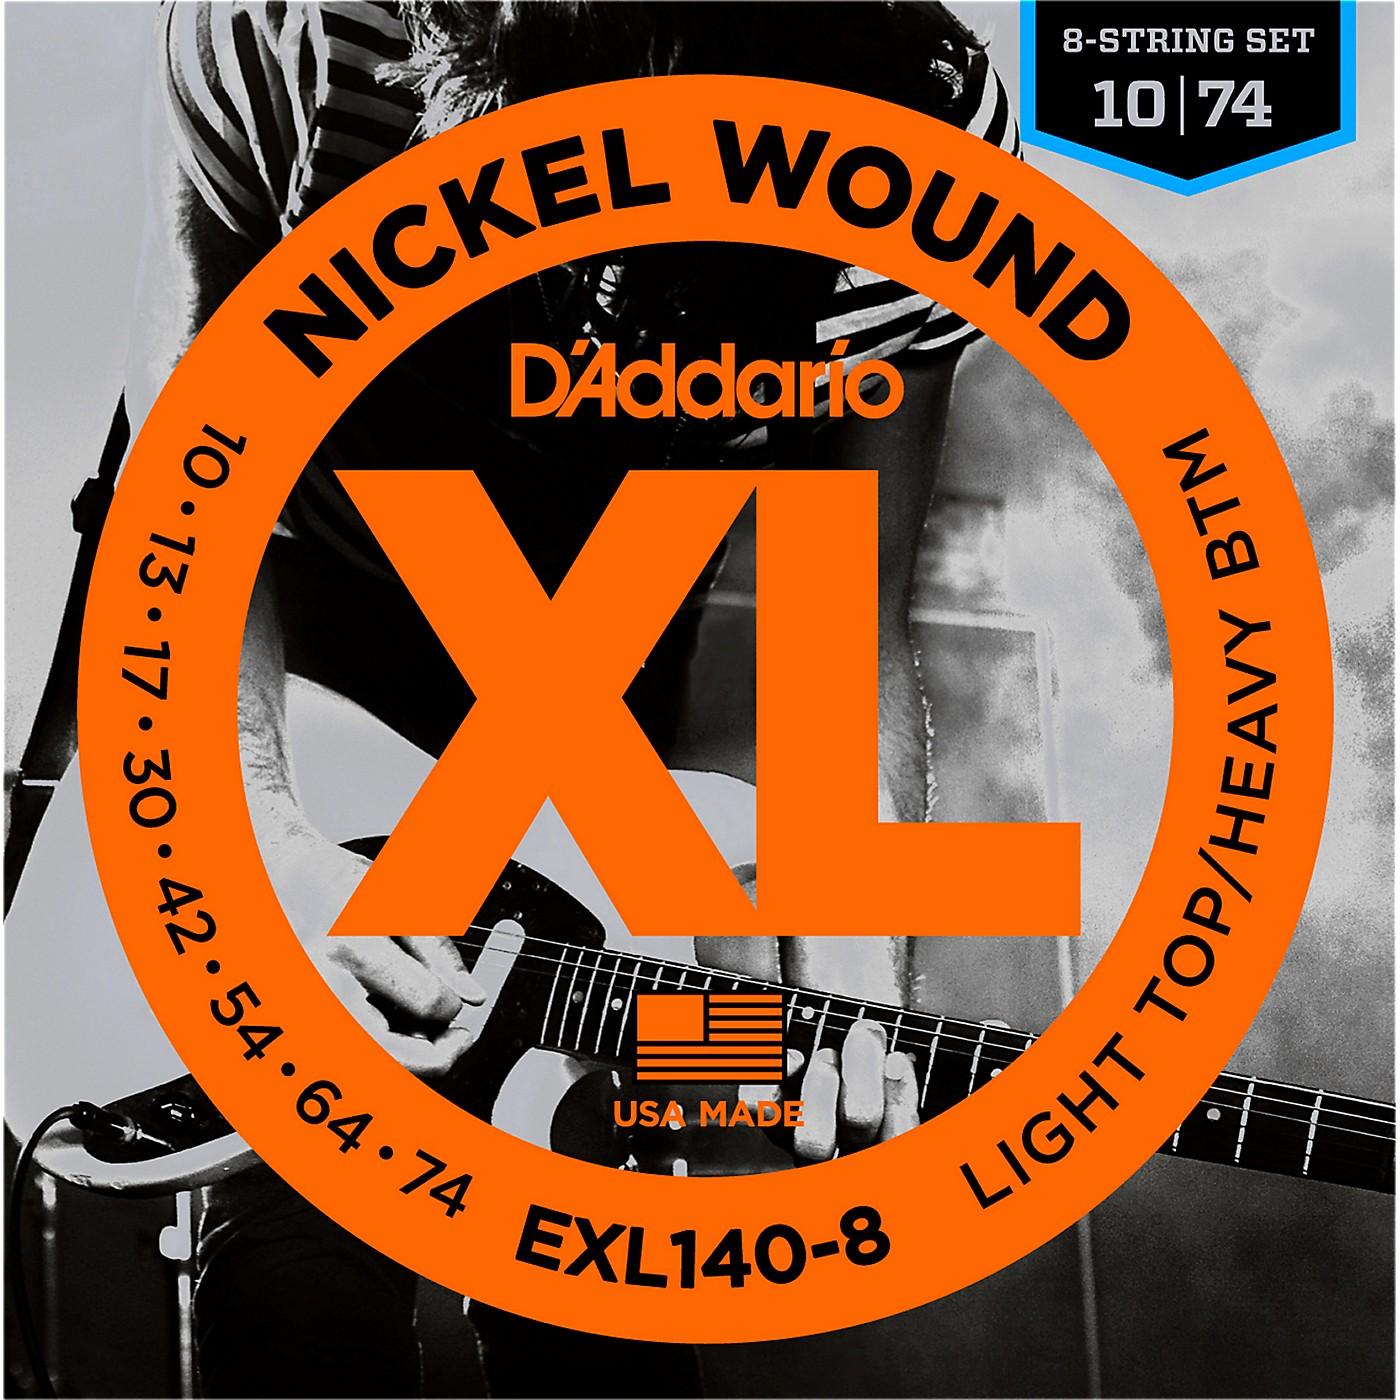 D'Addario EXL140 Light Top Heavy/Bottom 8-String Electric Guitar Strings thumbnail